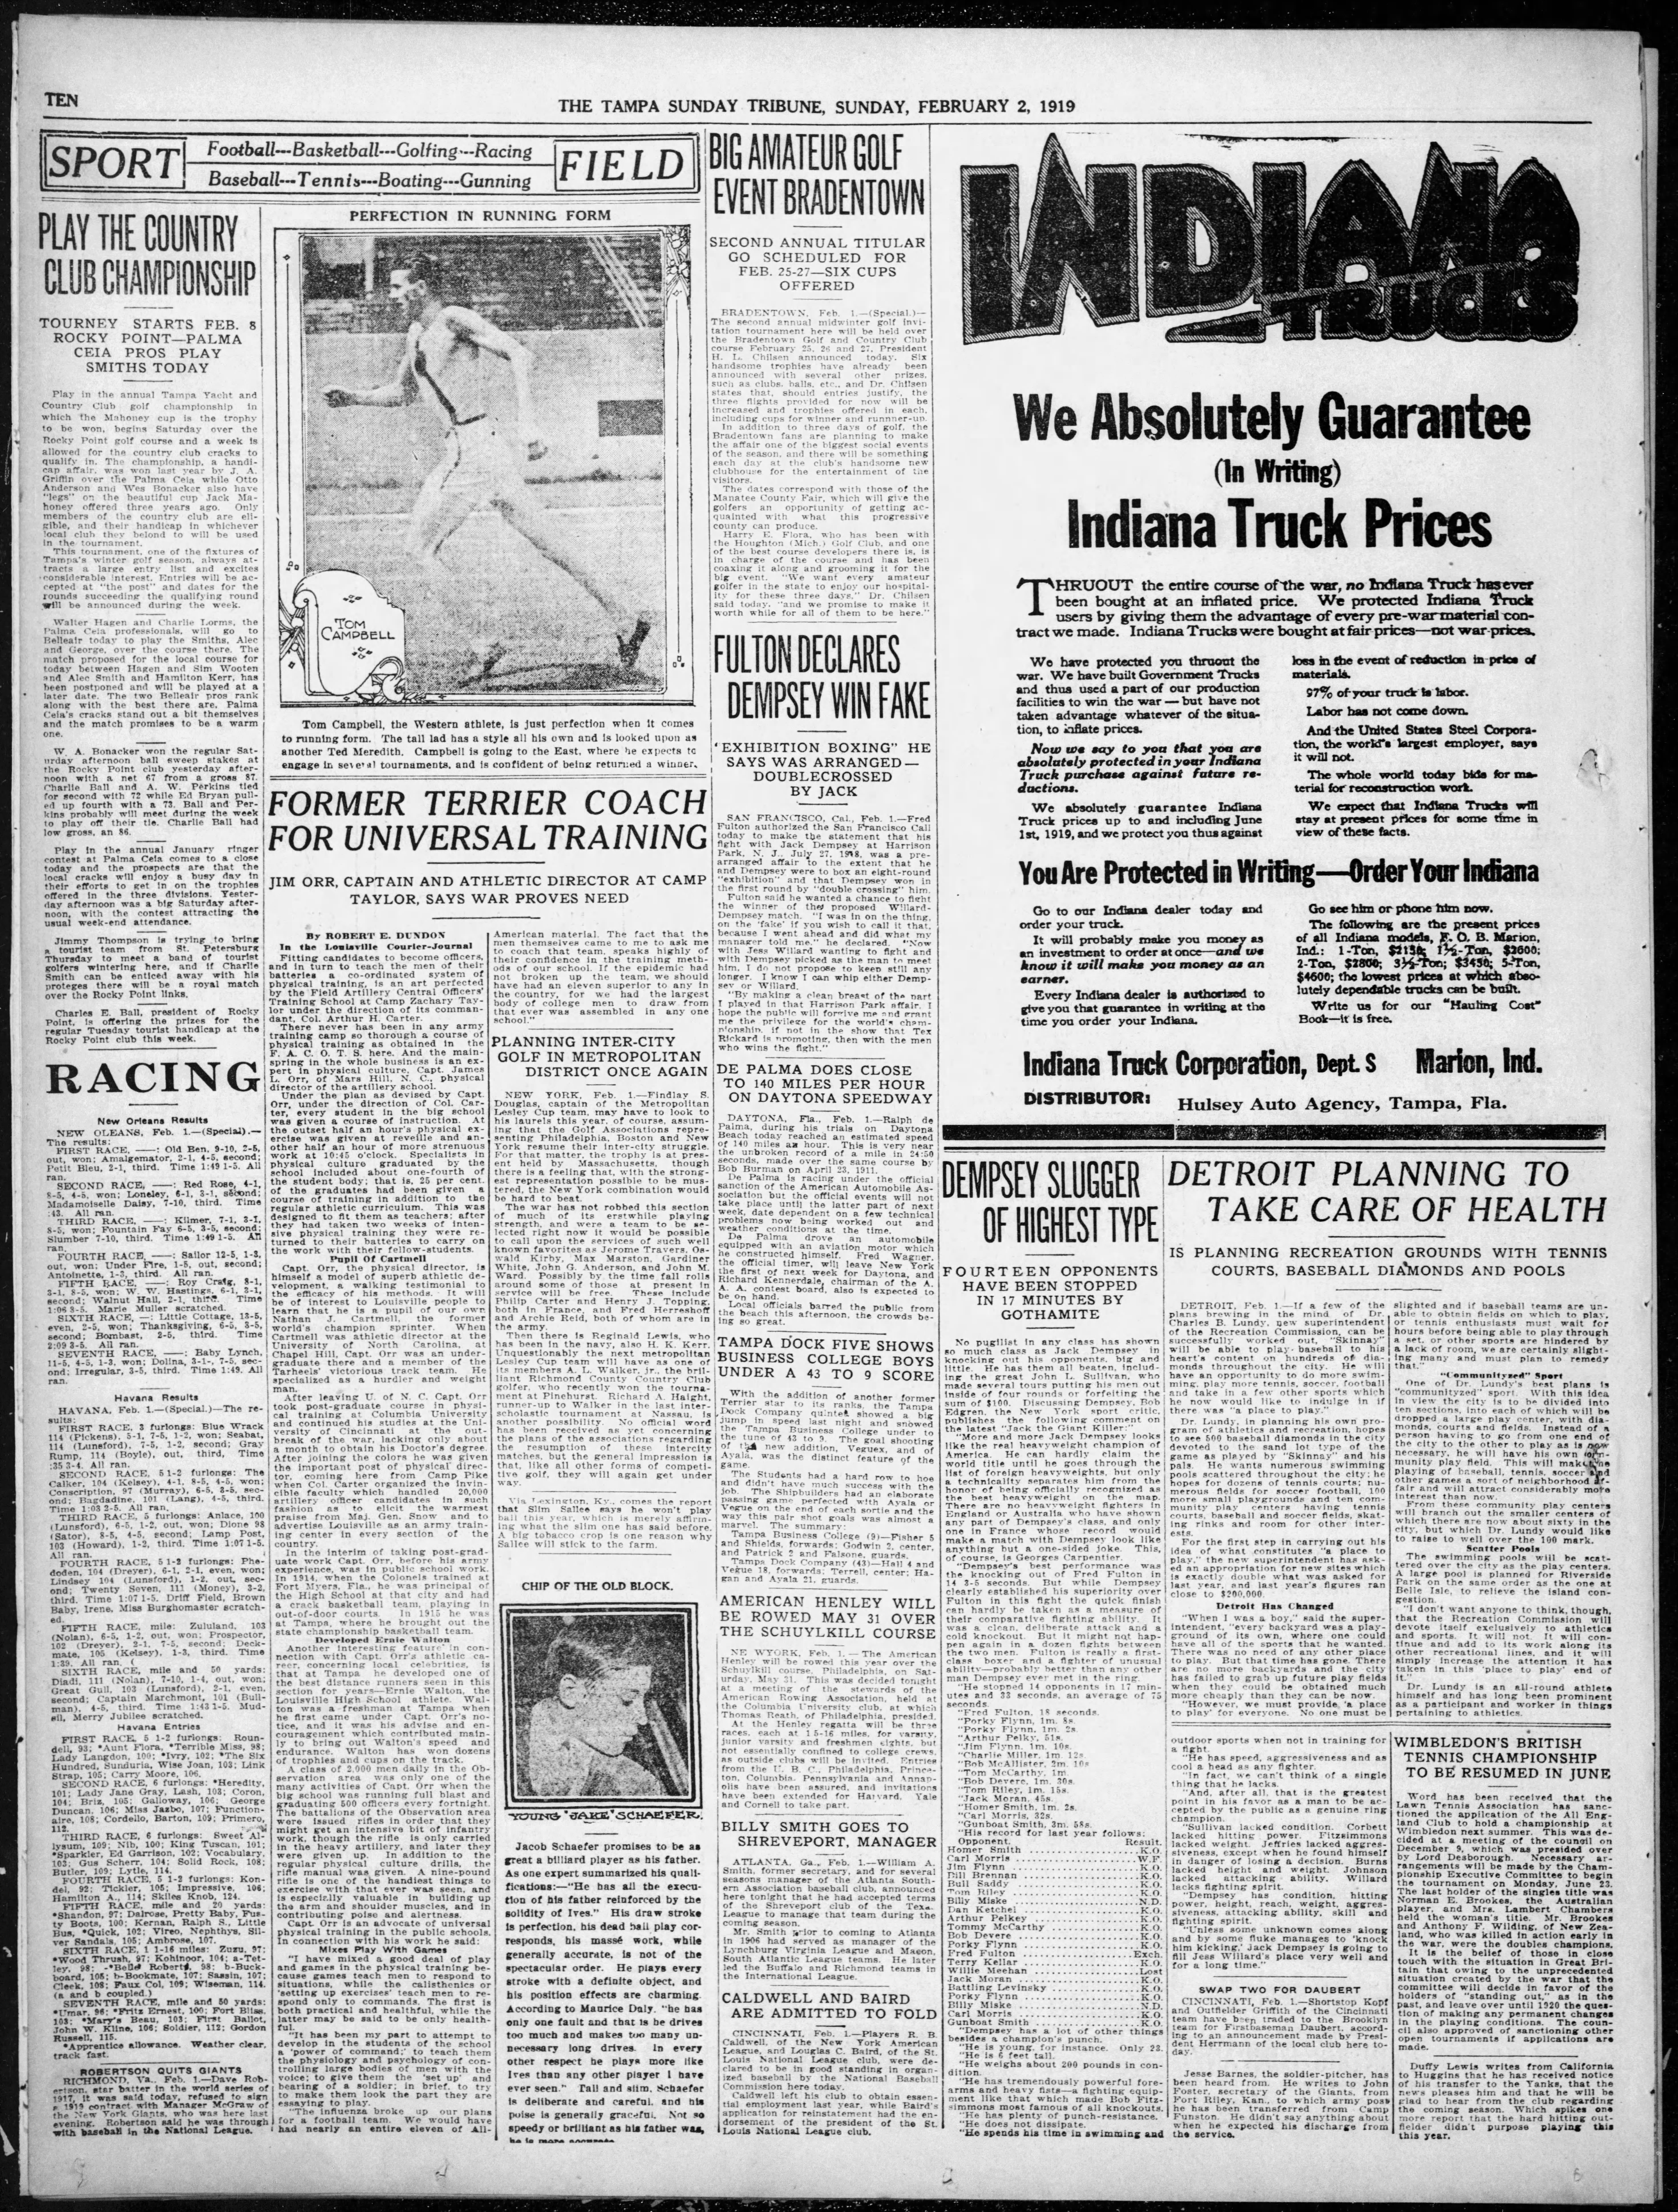 Play the Country Club Championship - Feb 2, 1919 Tampa Tribune